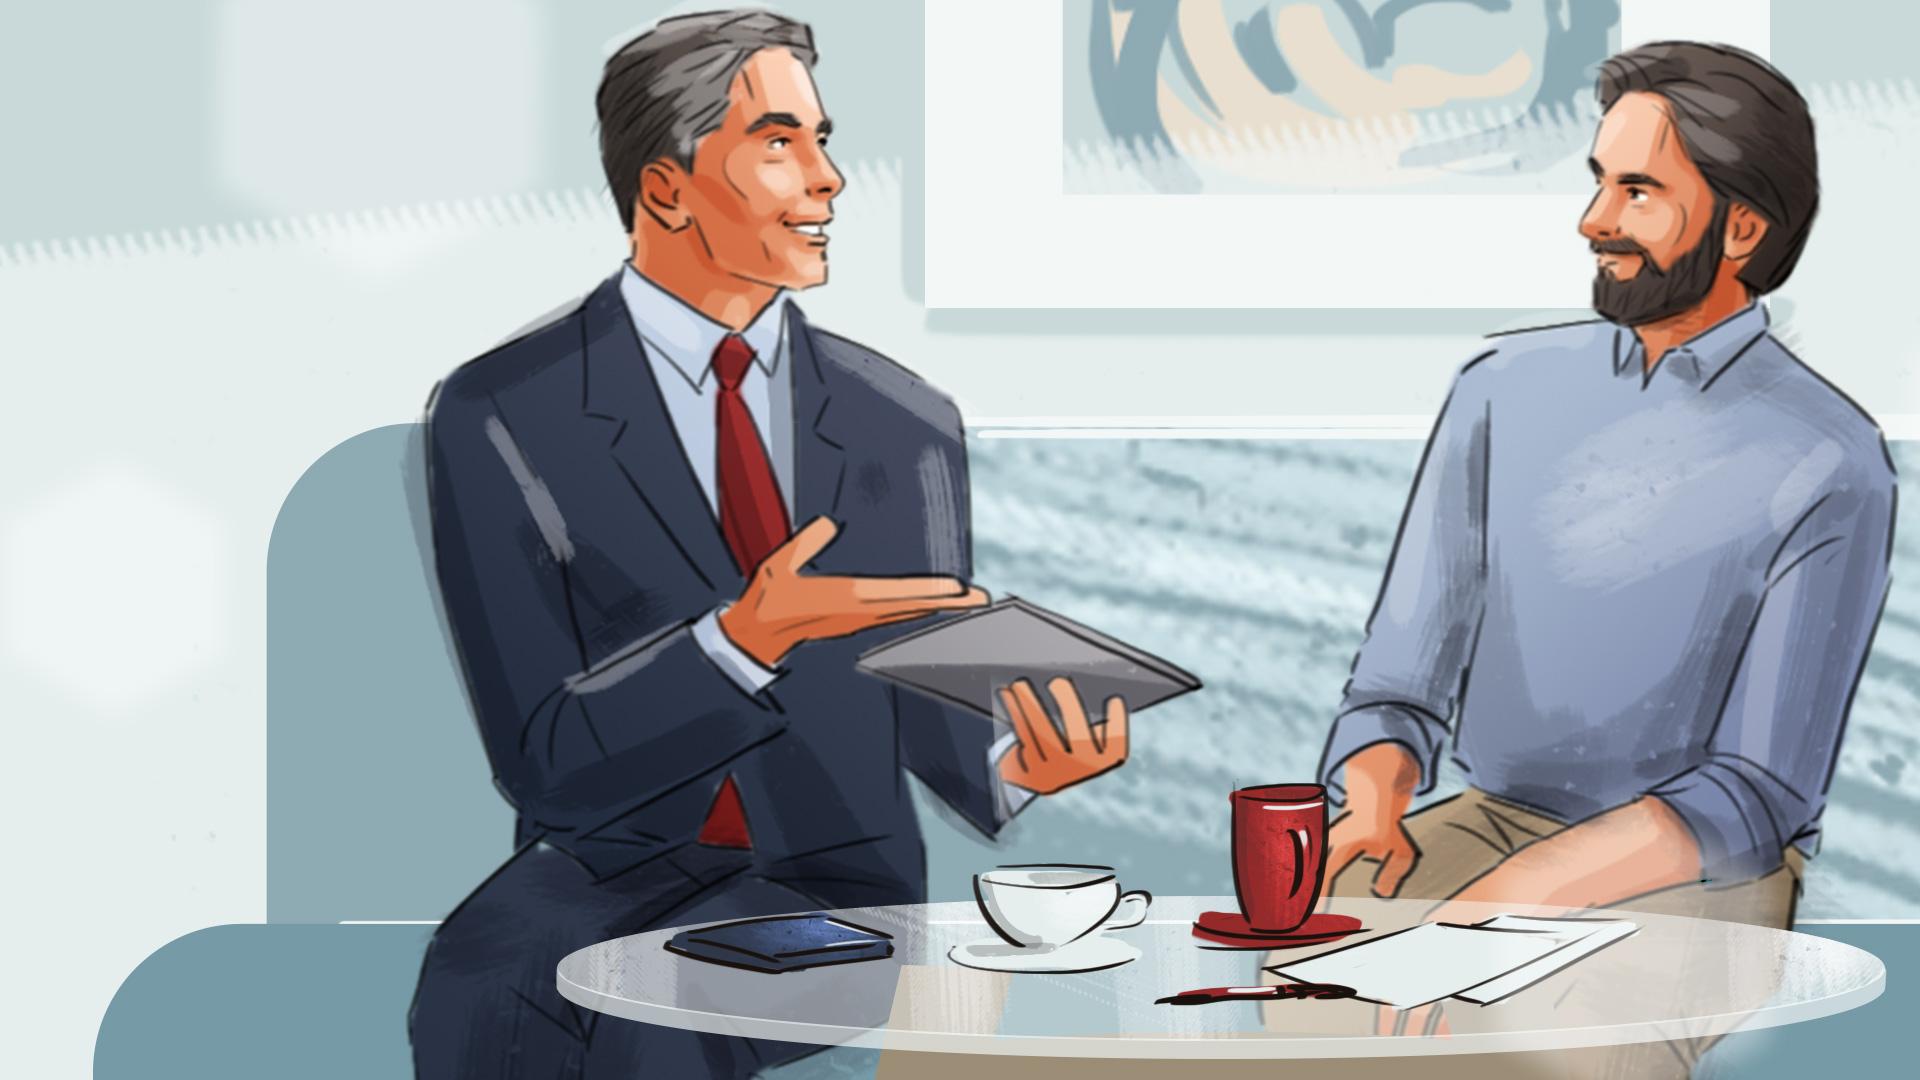 illustration bussines conversation advertising